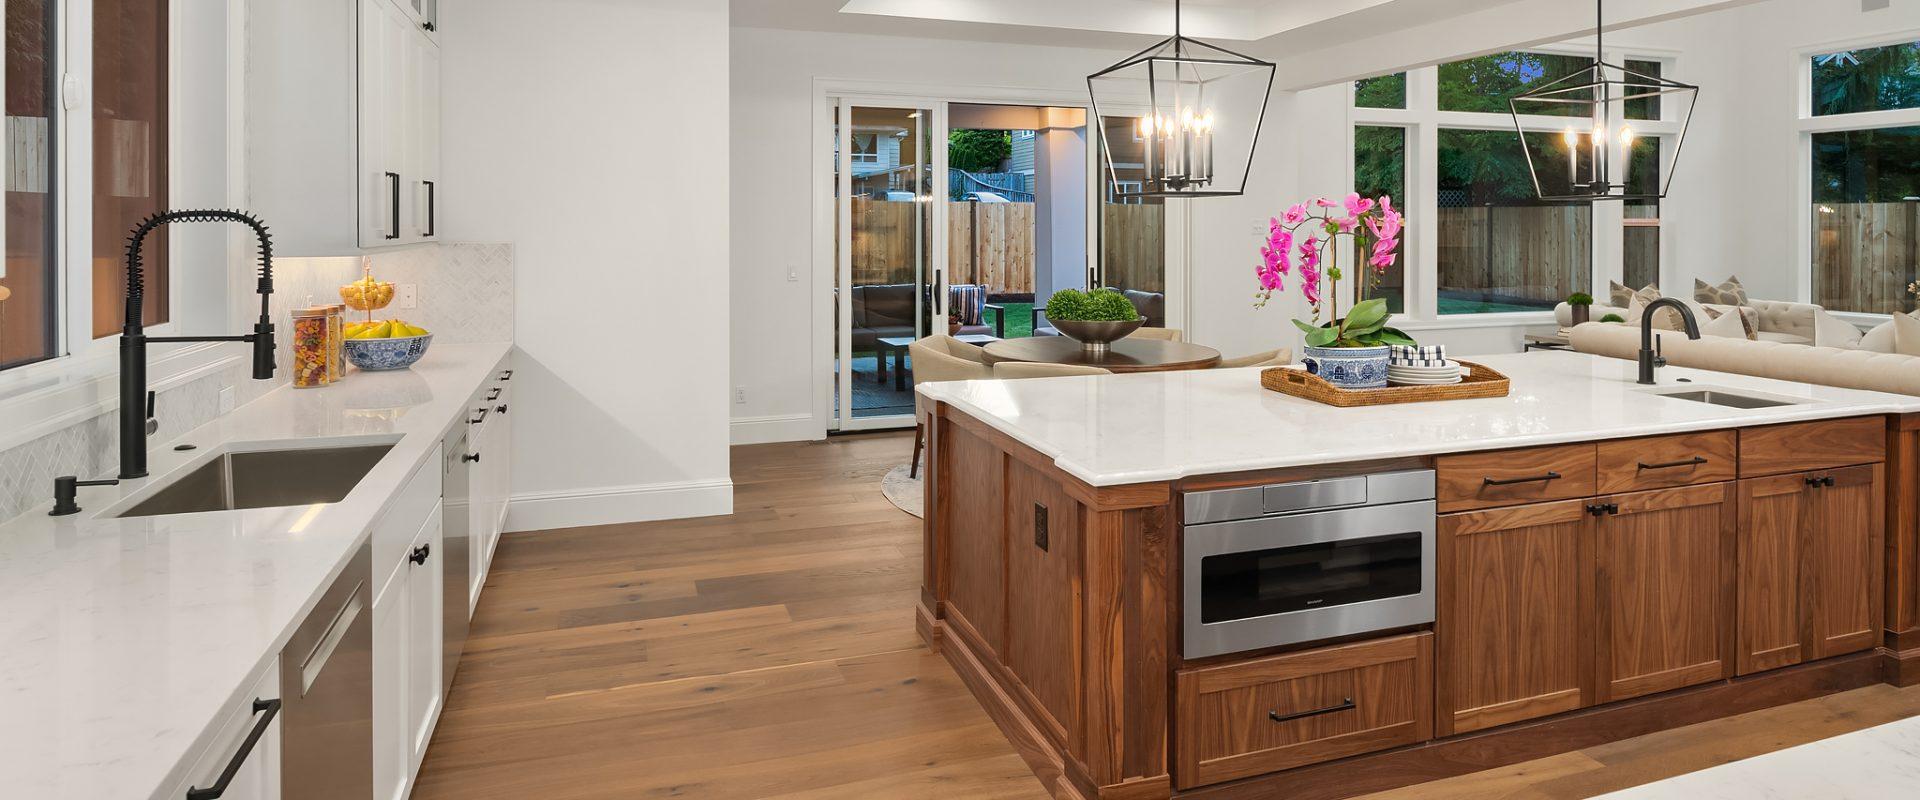 205-13-1645 105th Ave SE-Bellevue-WA-mn-custom-homes-kitchen